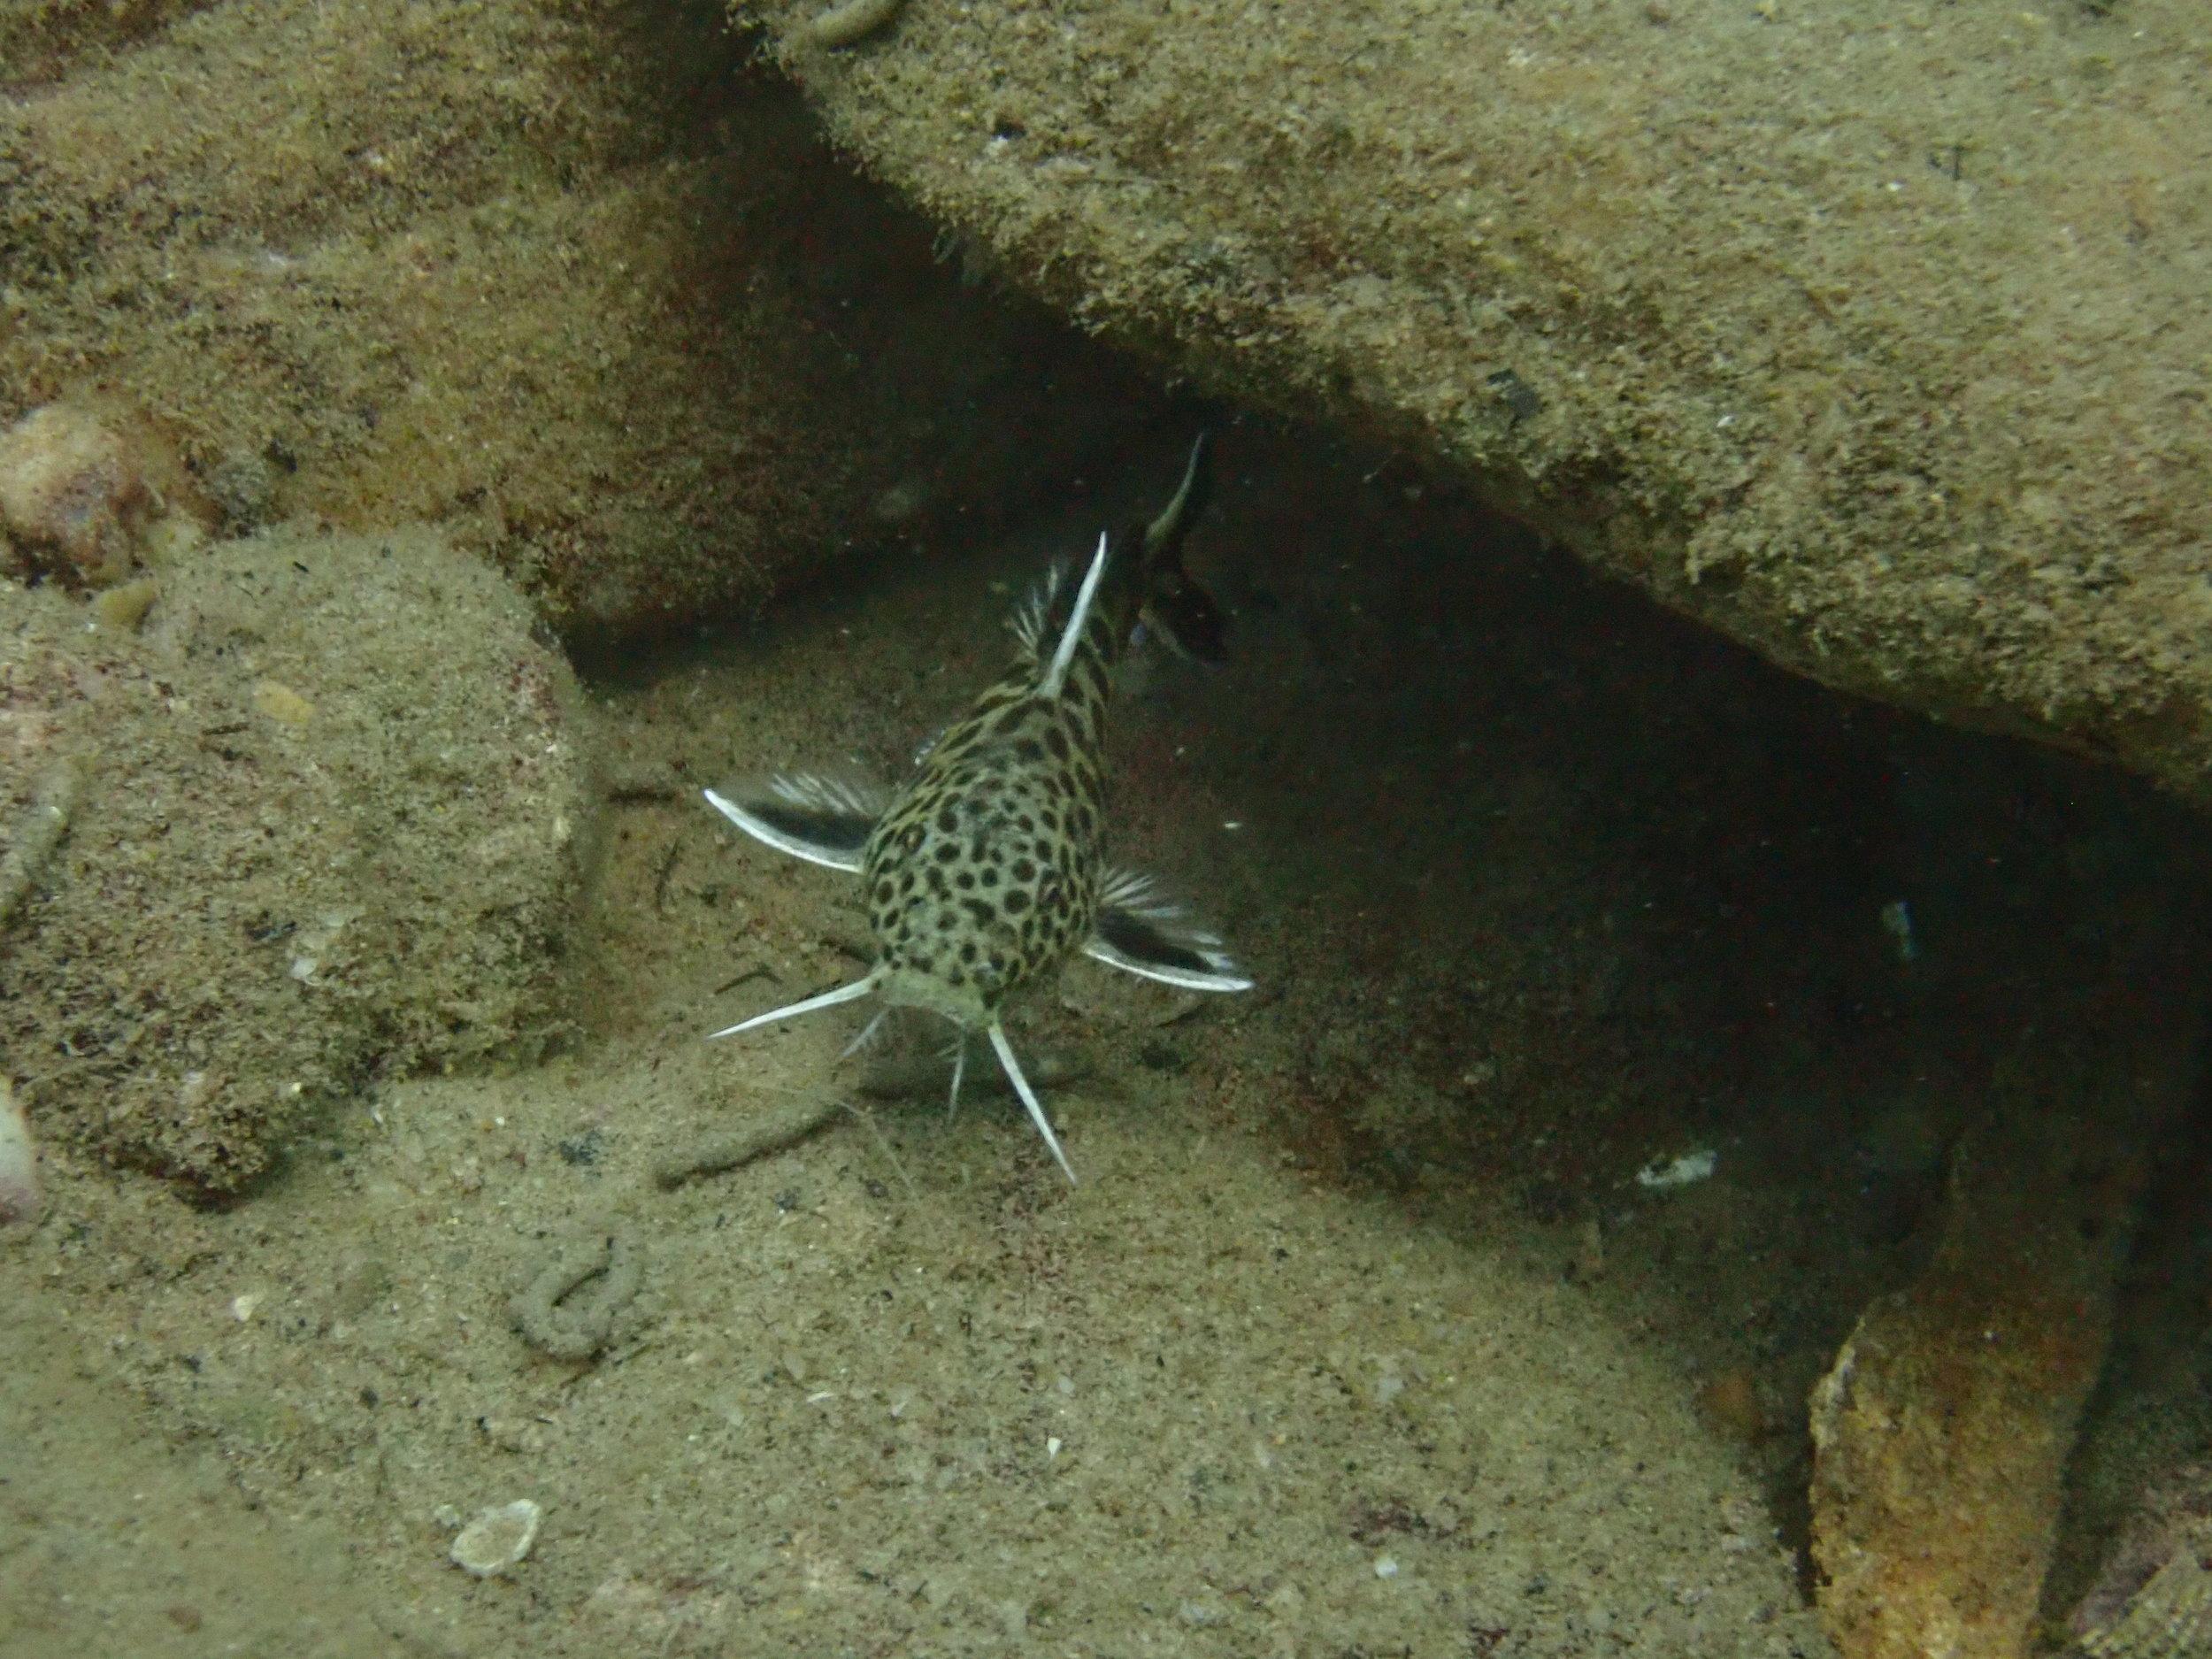 Synodontid catfish in Lake Tanganyika, Zambia (photo credit: Aneesh Bose)